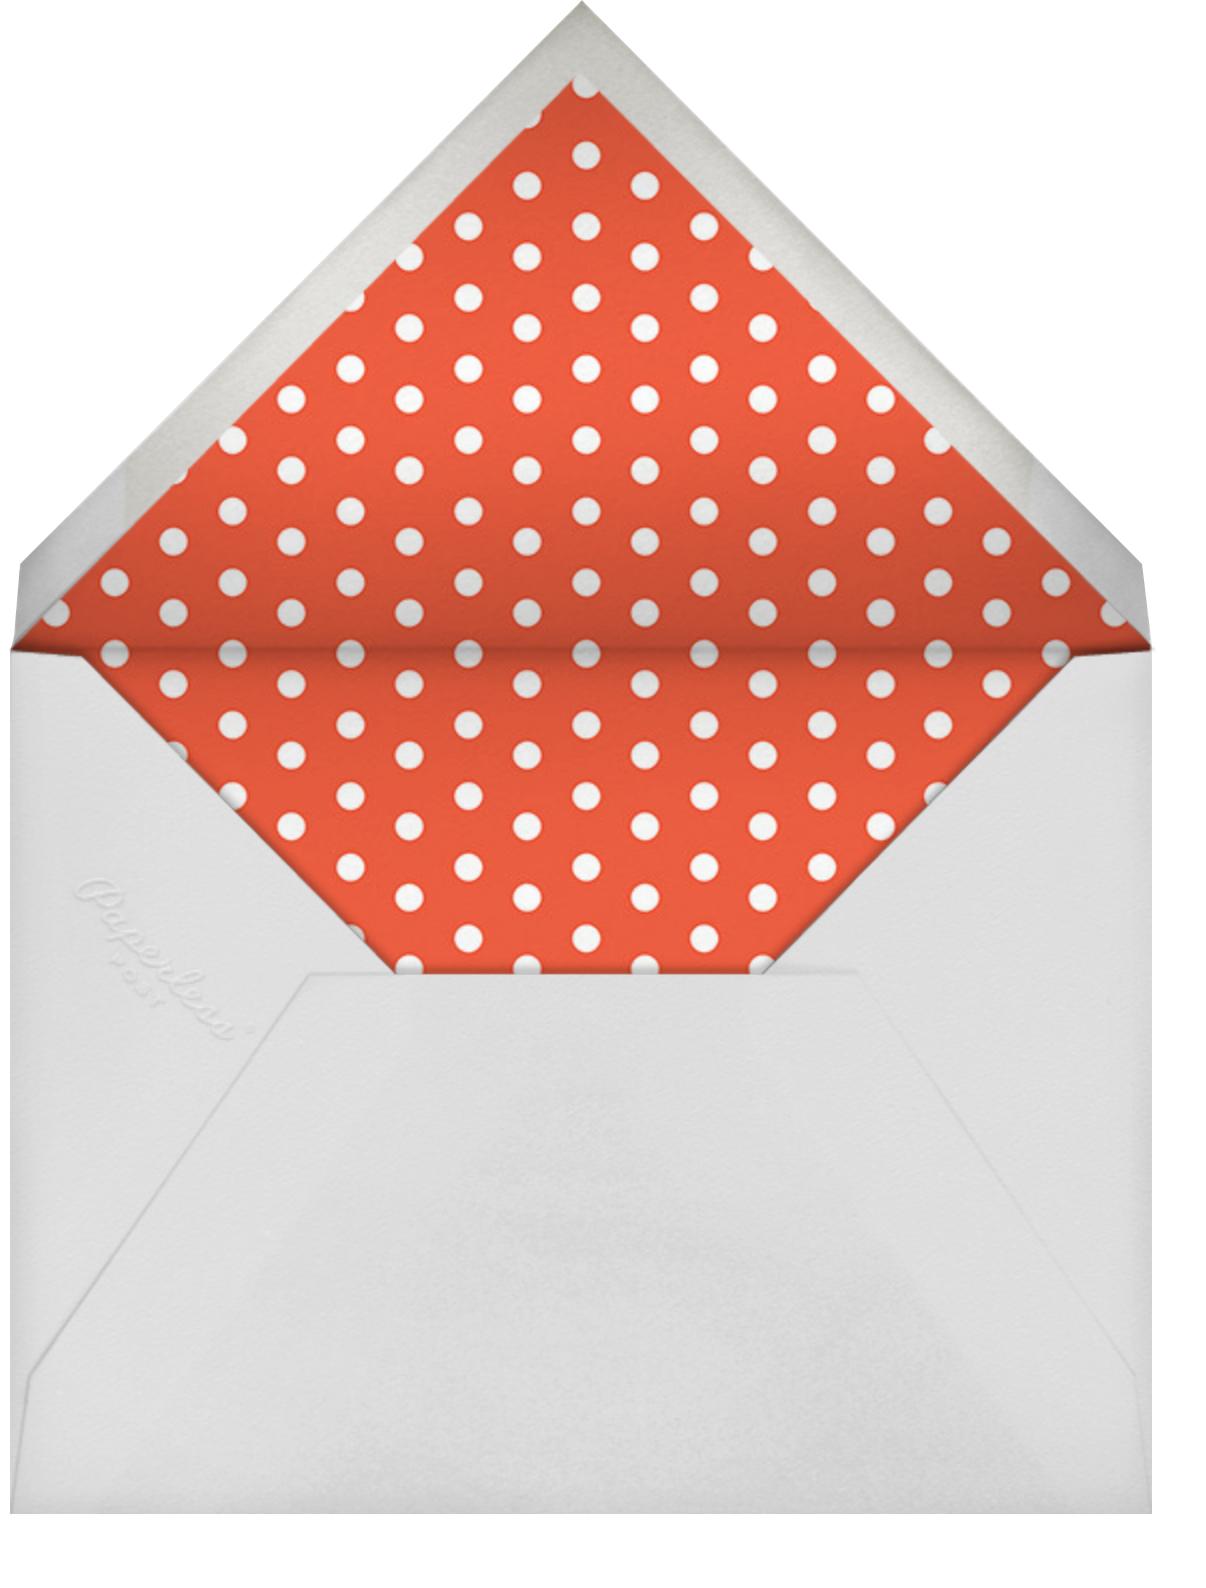 Ski Shades - Medium - Rifle Paper Co. - Winter entertaining - envelope back